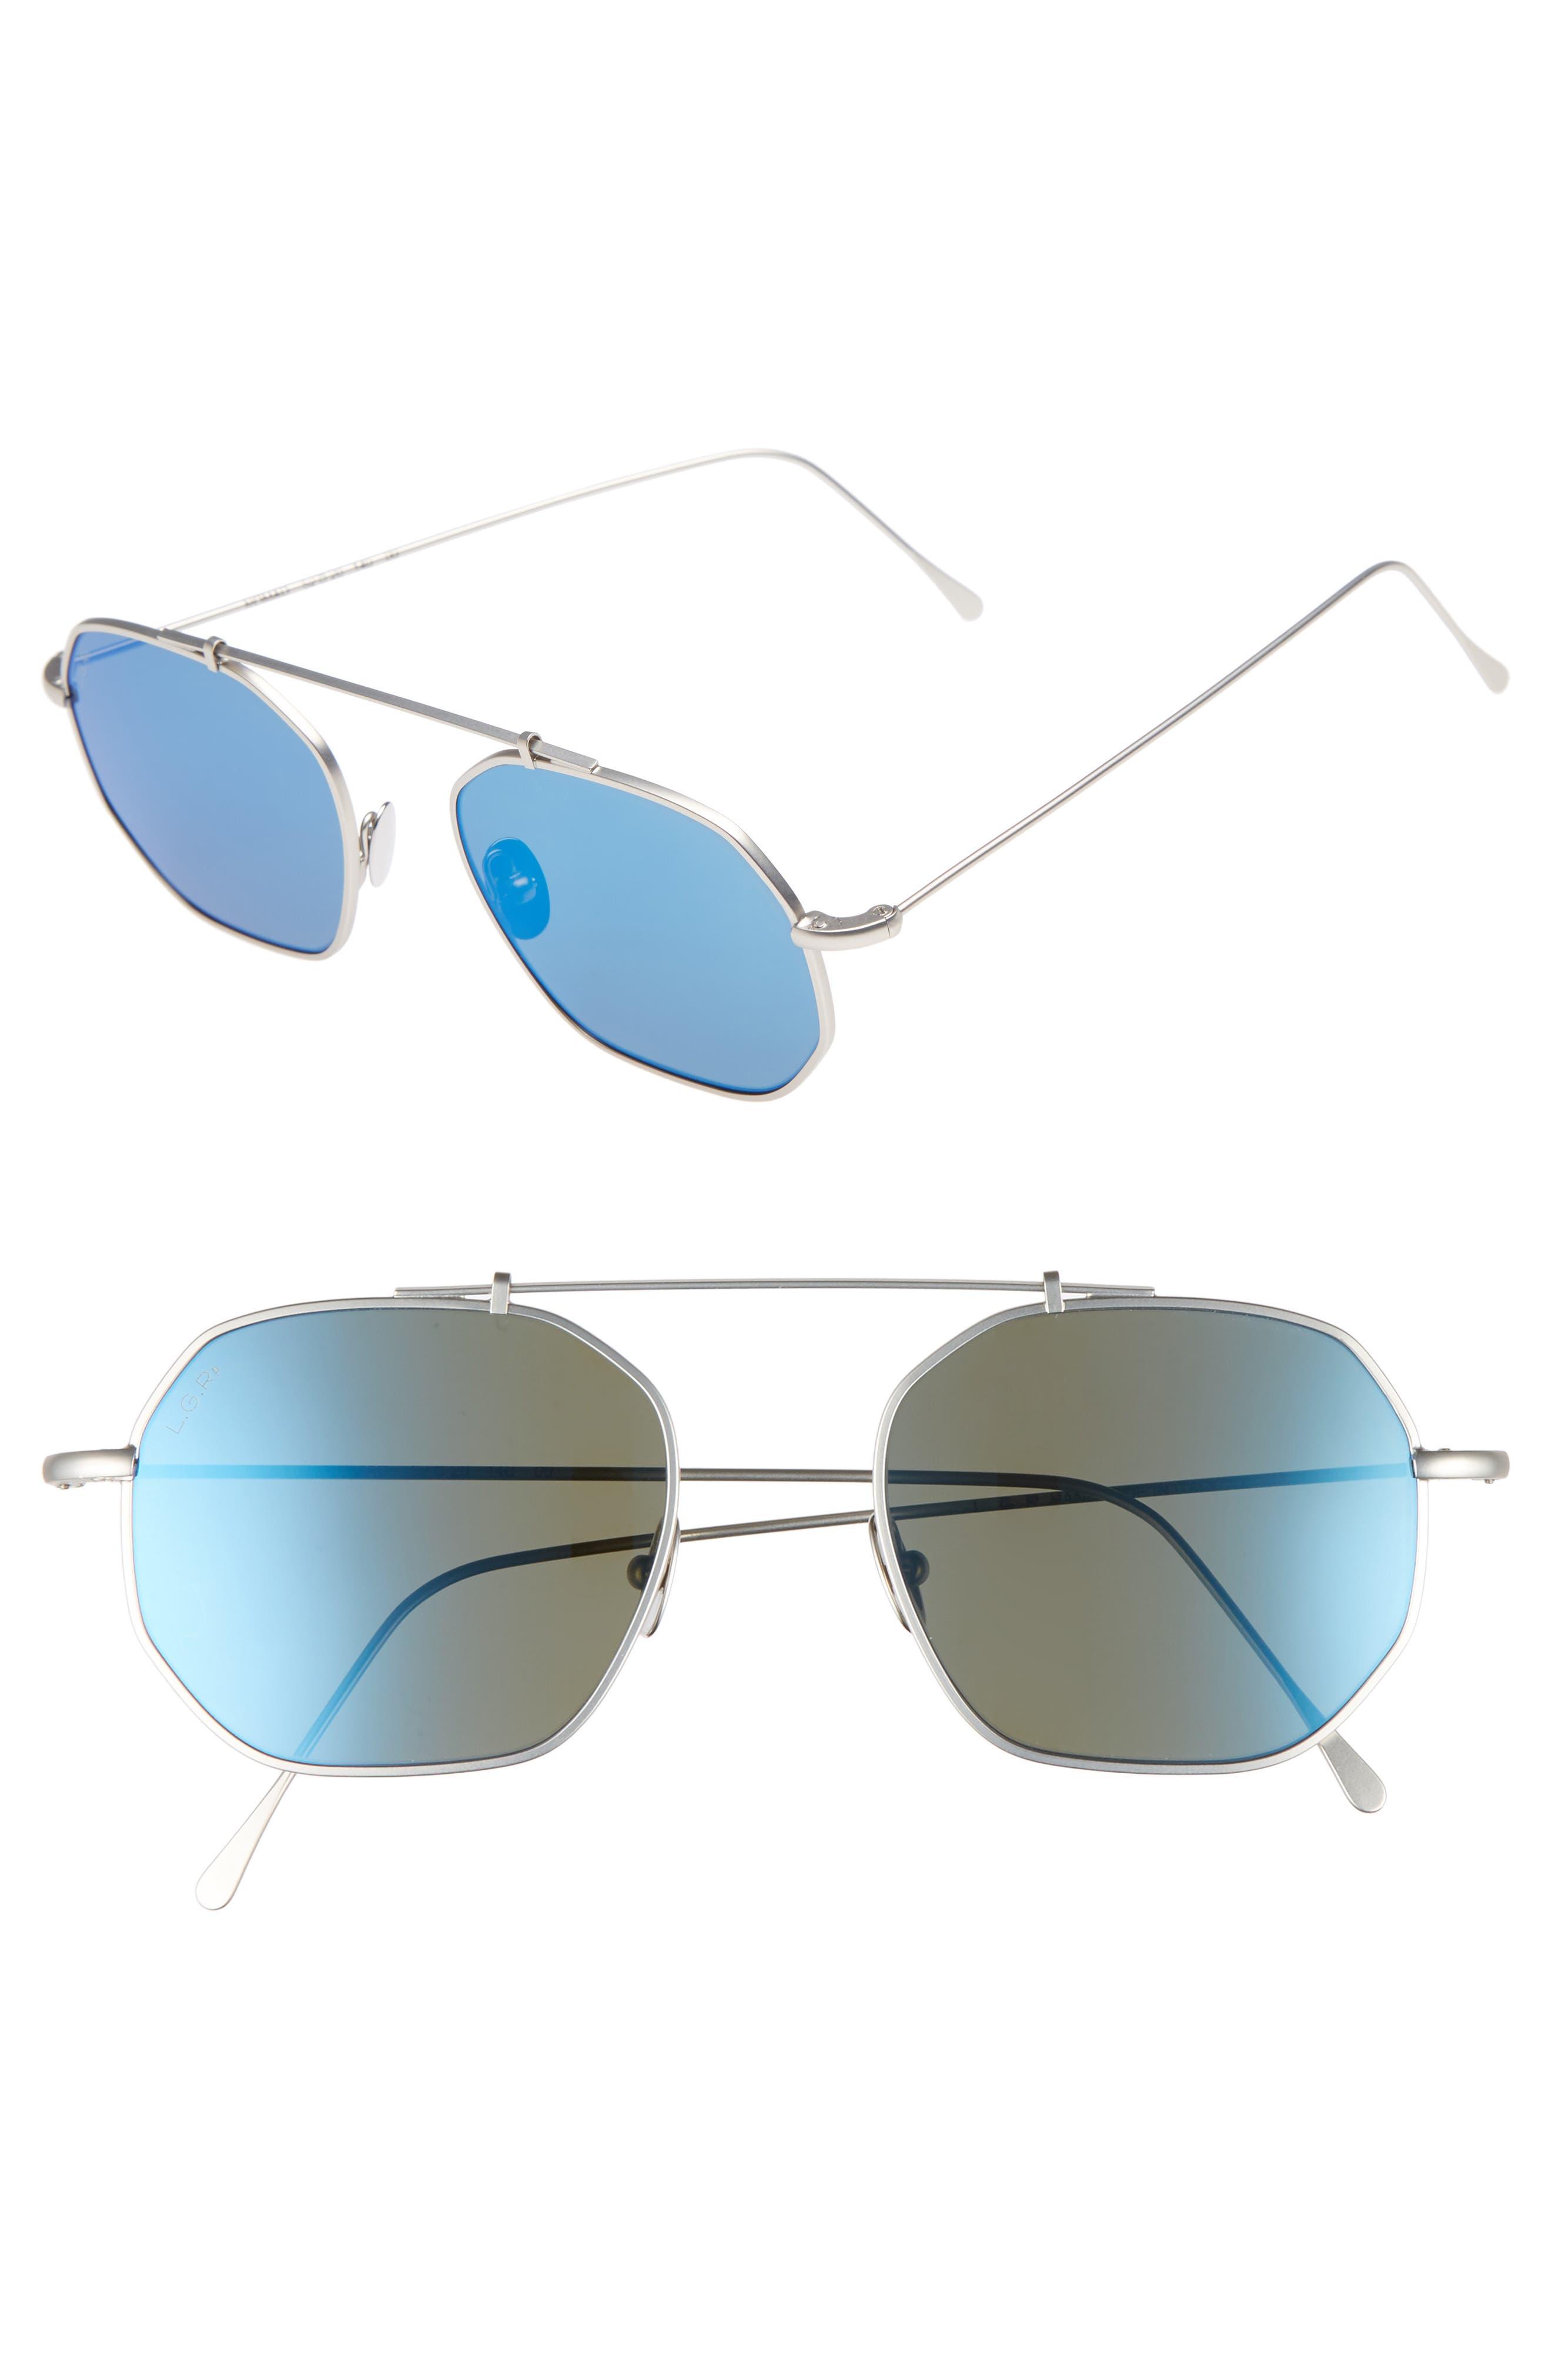 Nomad 52mm Polarized Sunglasses,                         Main,                         color, Silver Matte/ Blue Mirror